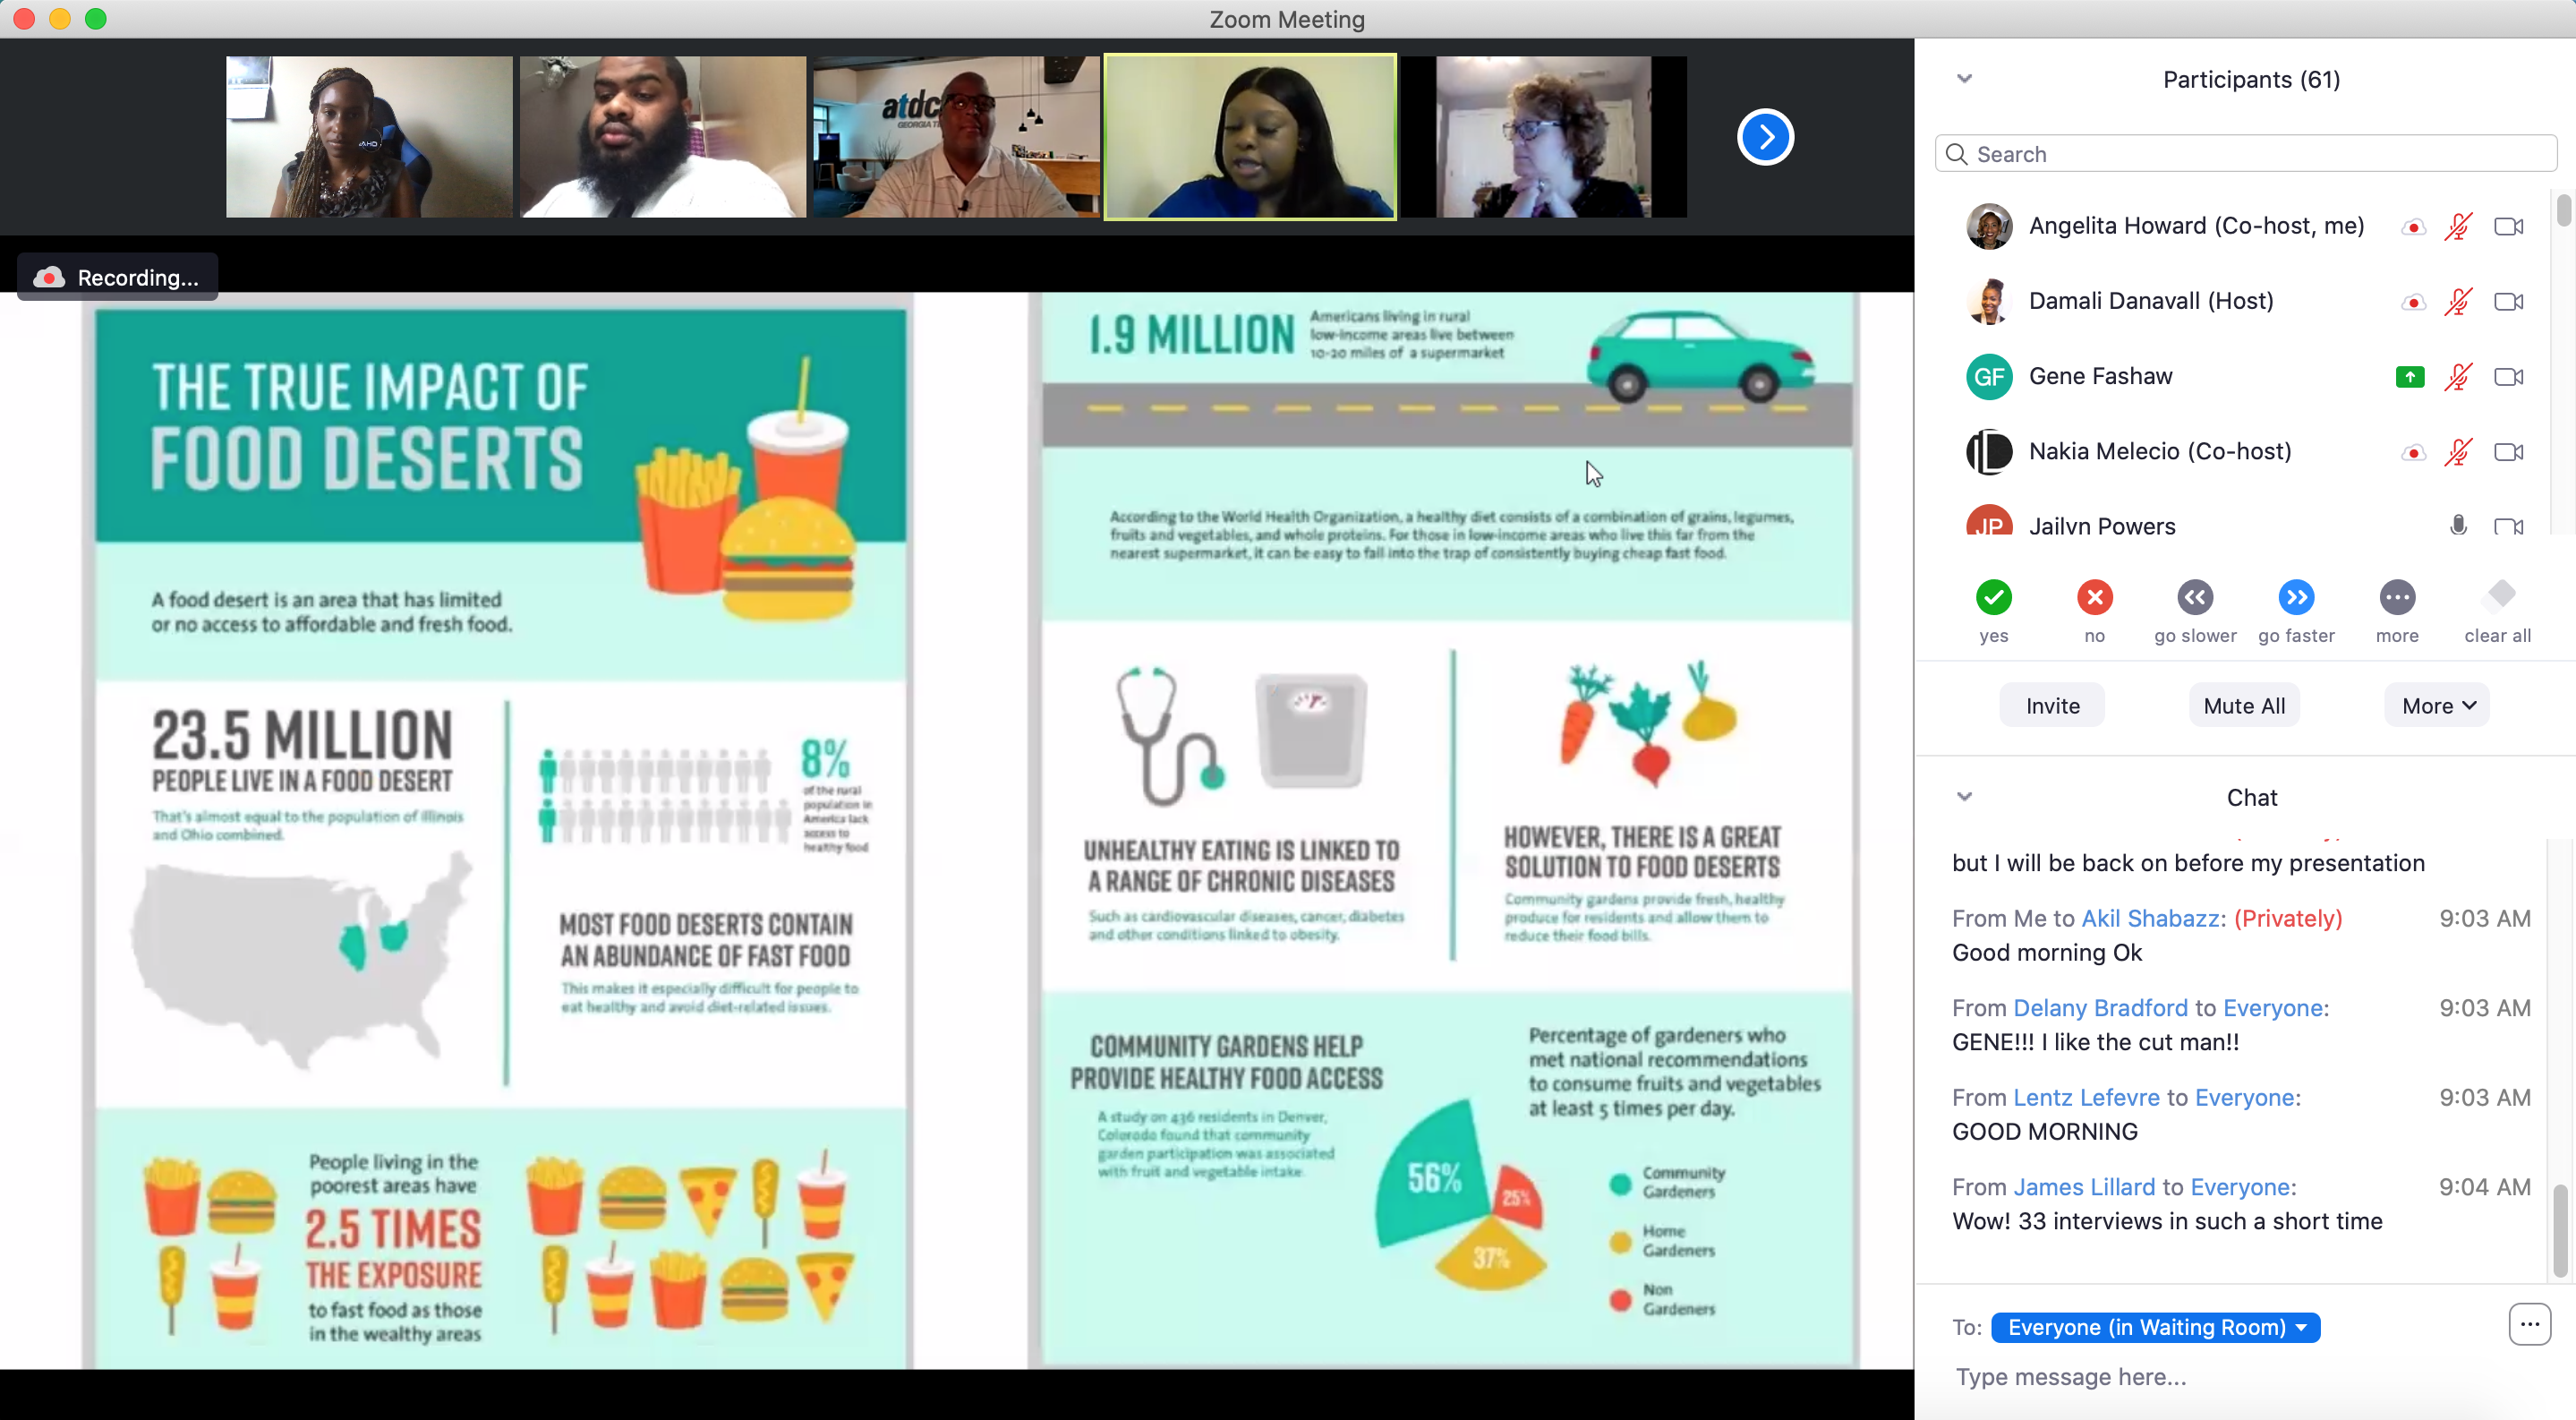 A screenshot of the Morehouse School of Medicine summer biotech bridge program instruction